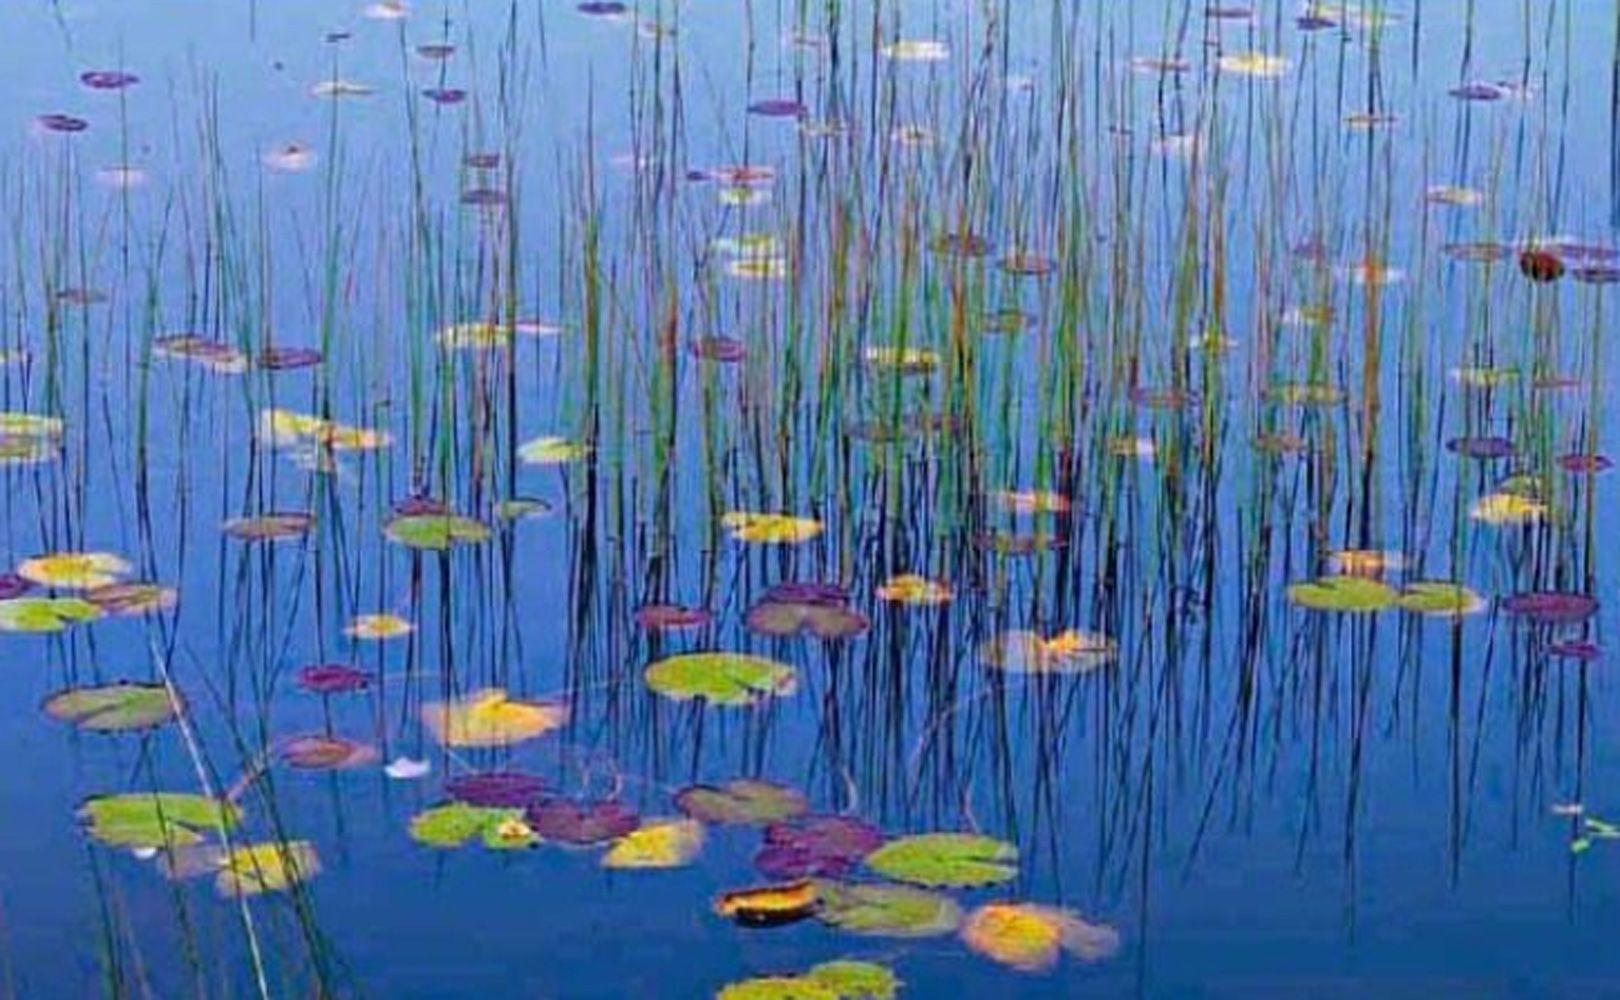 Water Lilies  by Peter Lik - Silver Halide Fuji Crystal Archive Print